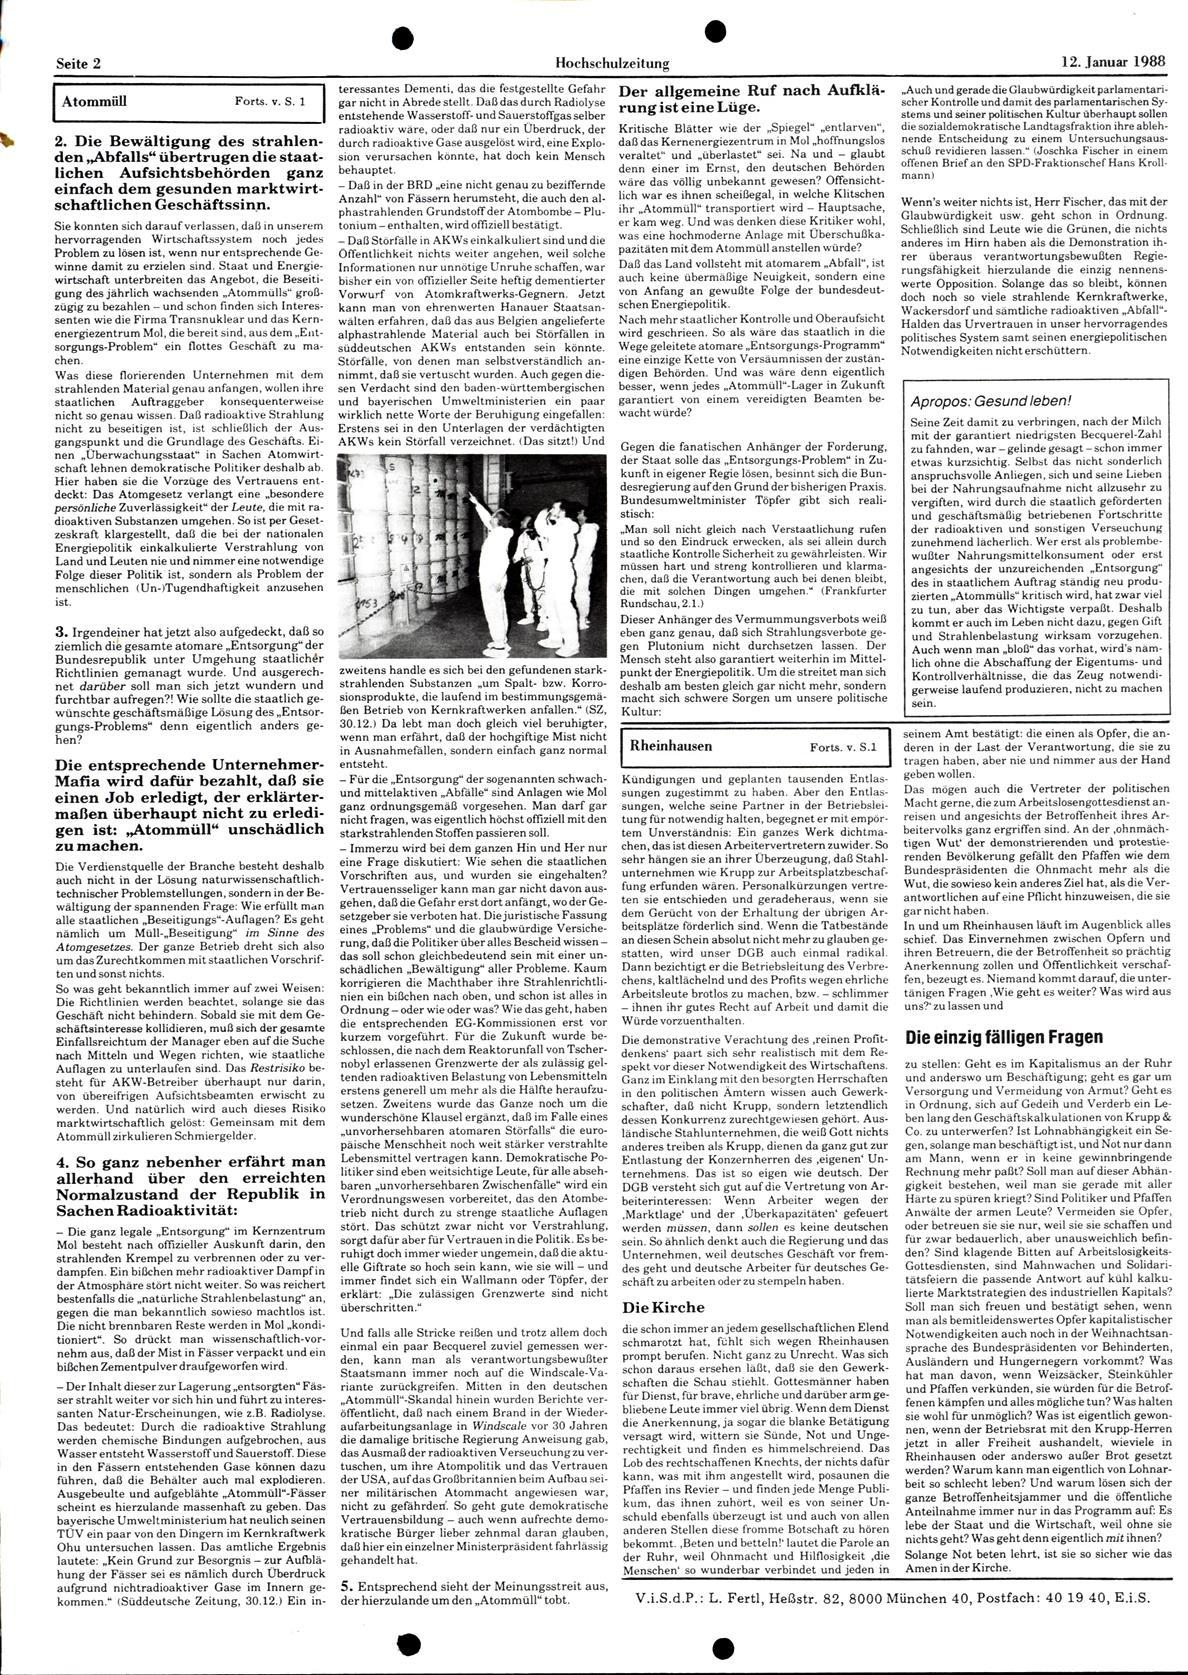 Bochum_BHZ_19880112_162_002